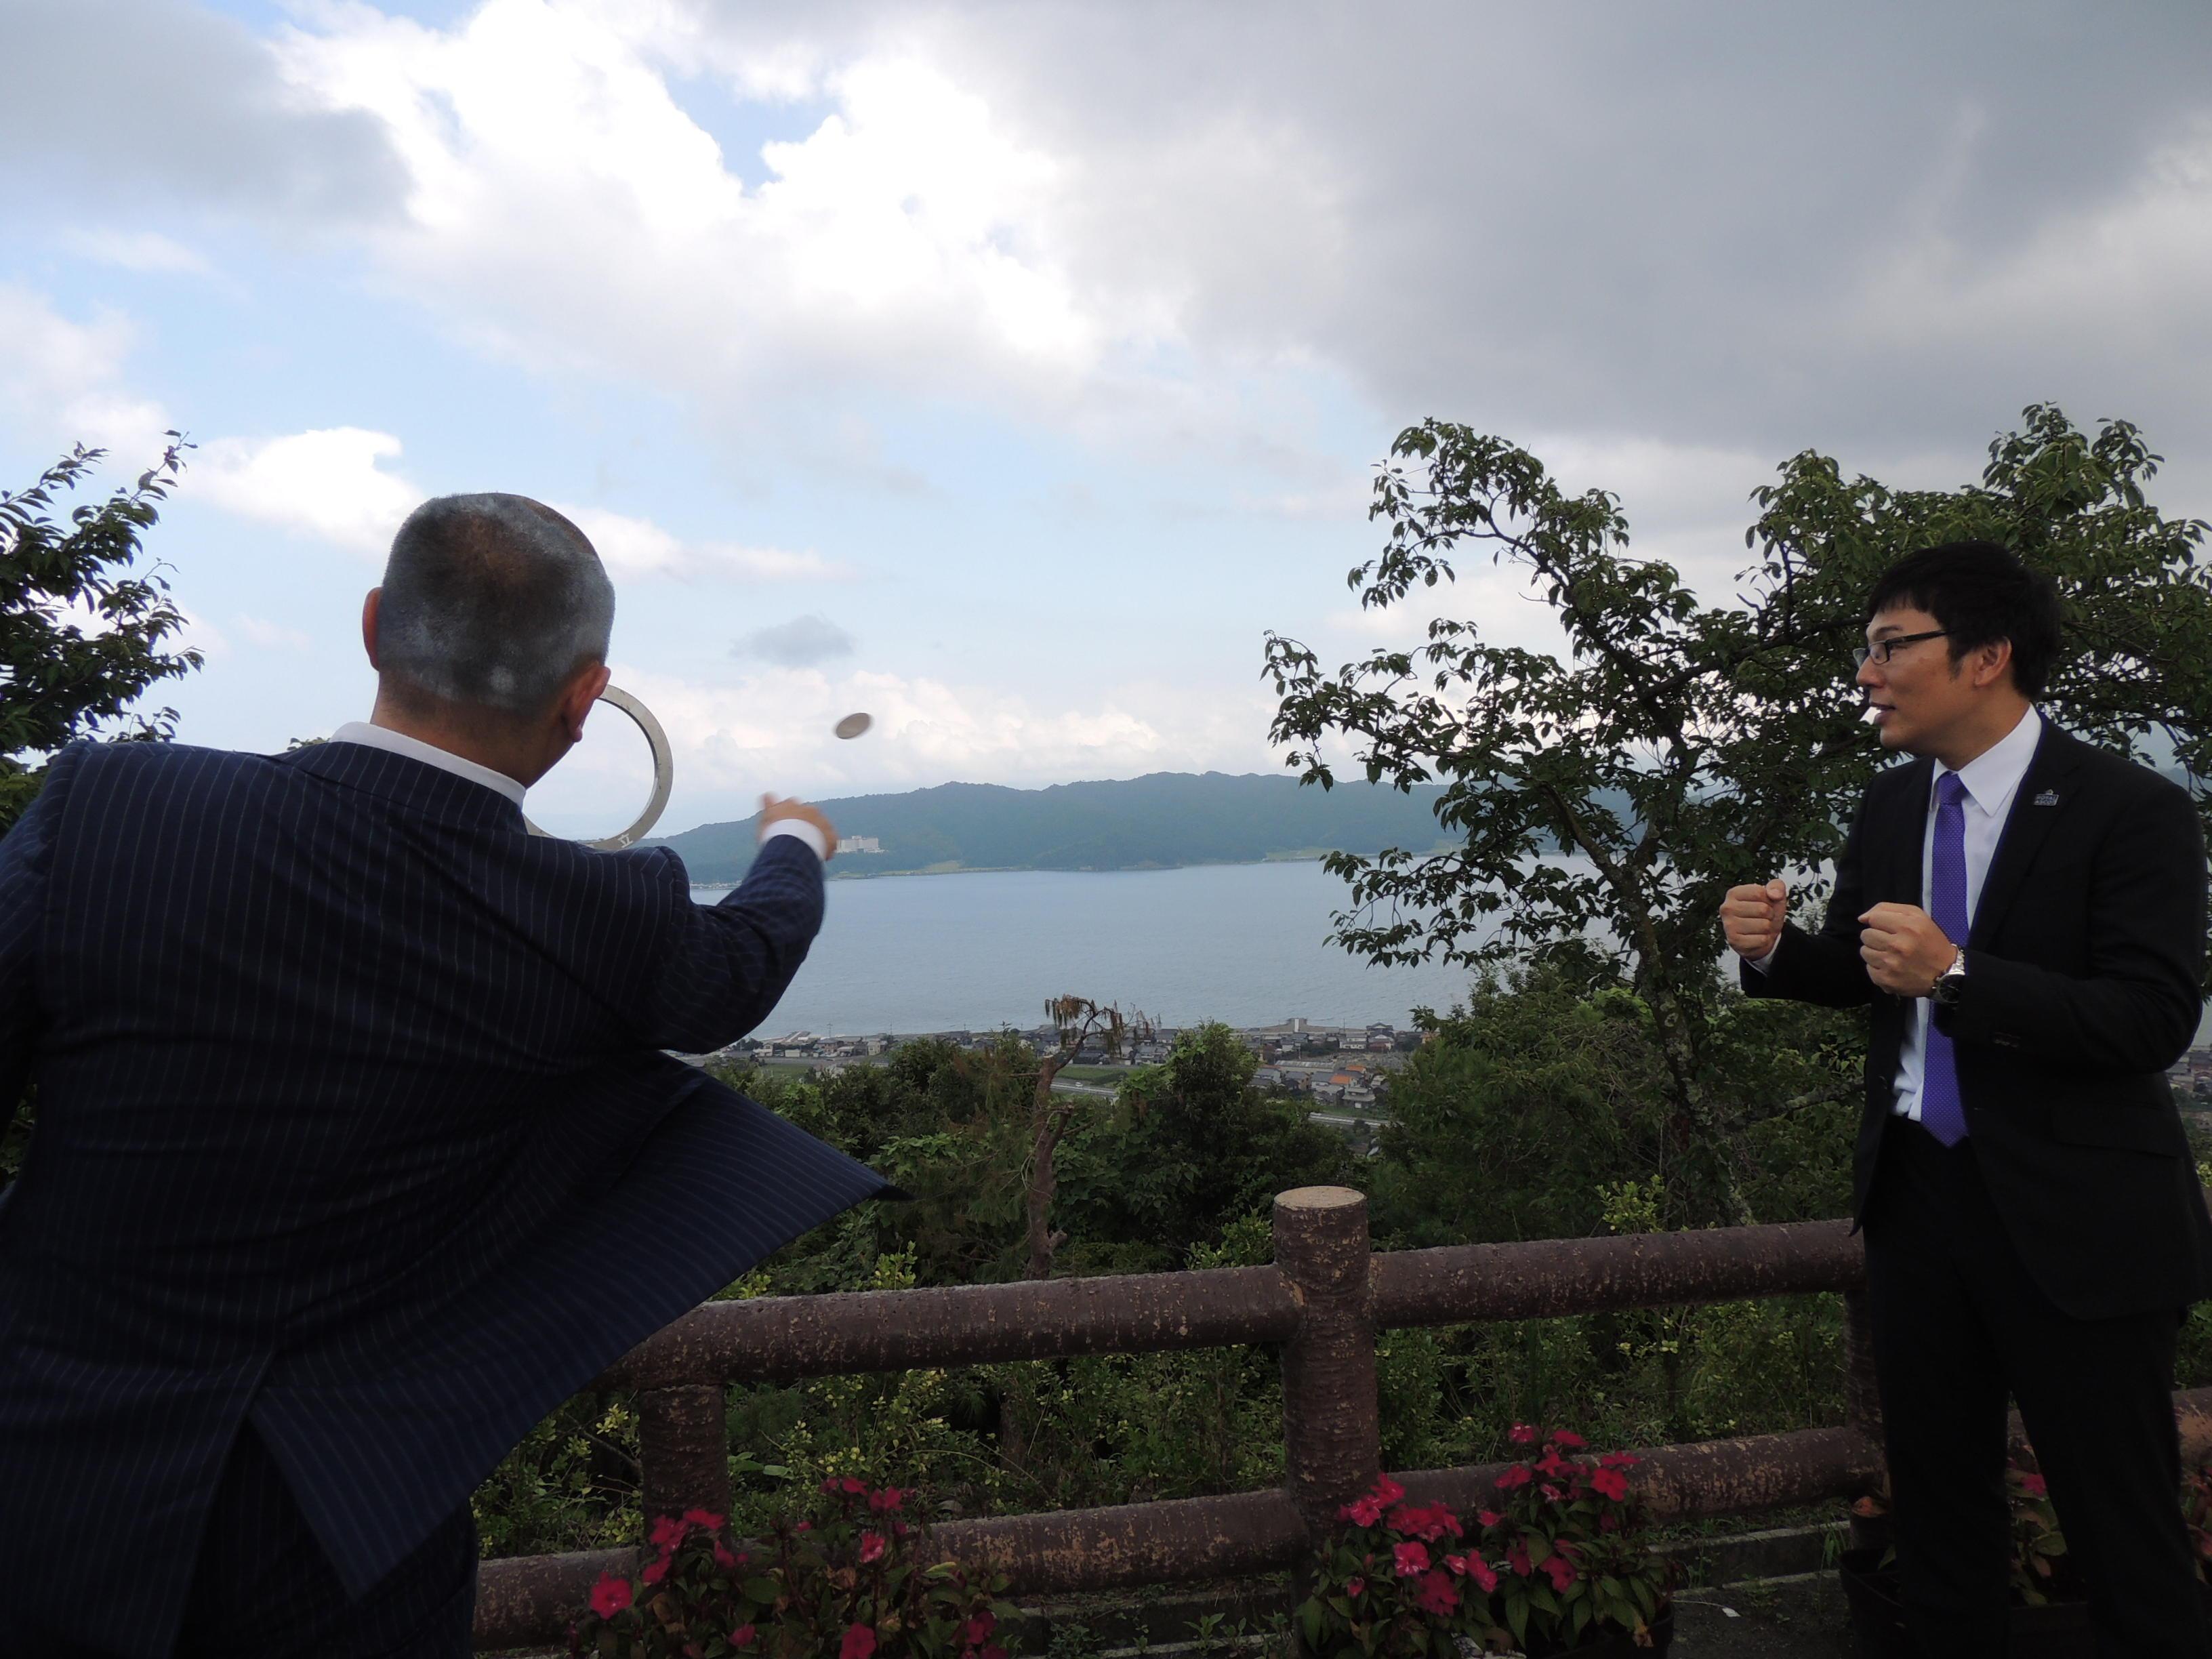 http://news.yoshimoto.co.jp/20160903210511-ac8022e66e7575ef06a5e5717176258749d05da4.jpg